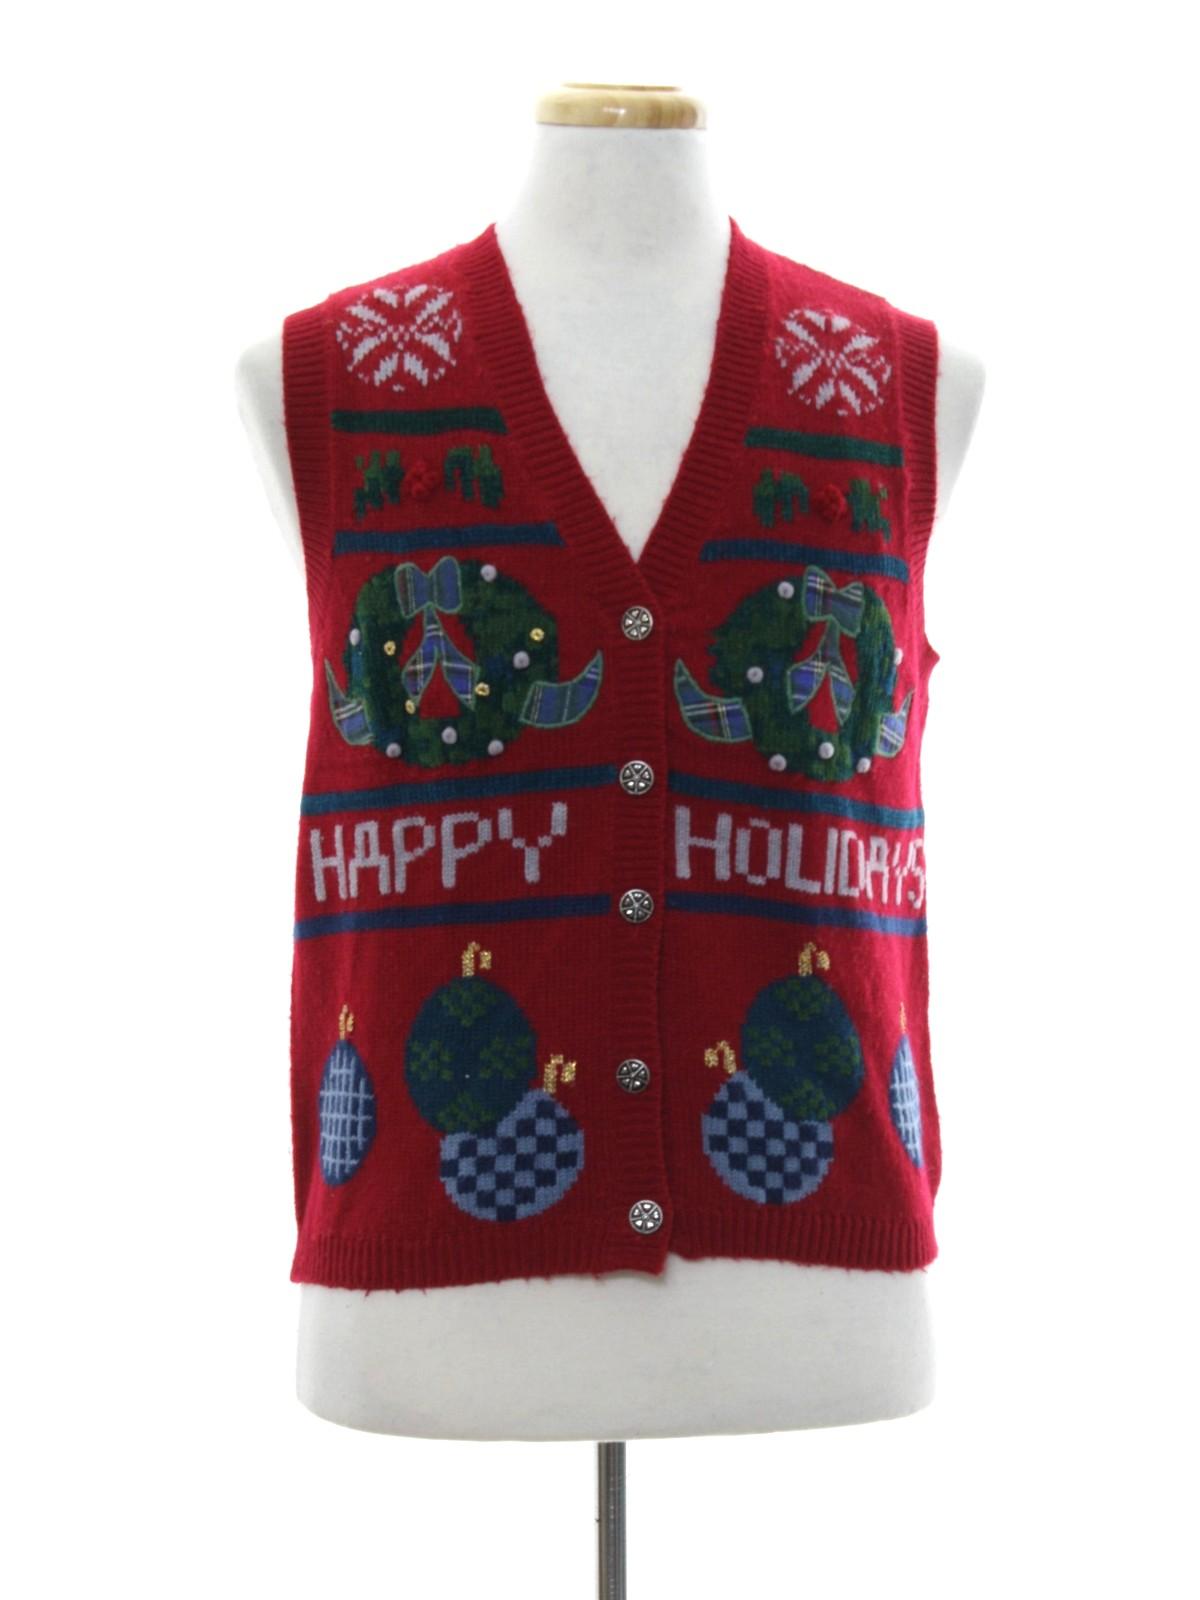 Womens Ugly Christmas Sweater Vest: -Karen Scott- Womens berry red